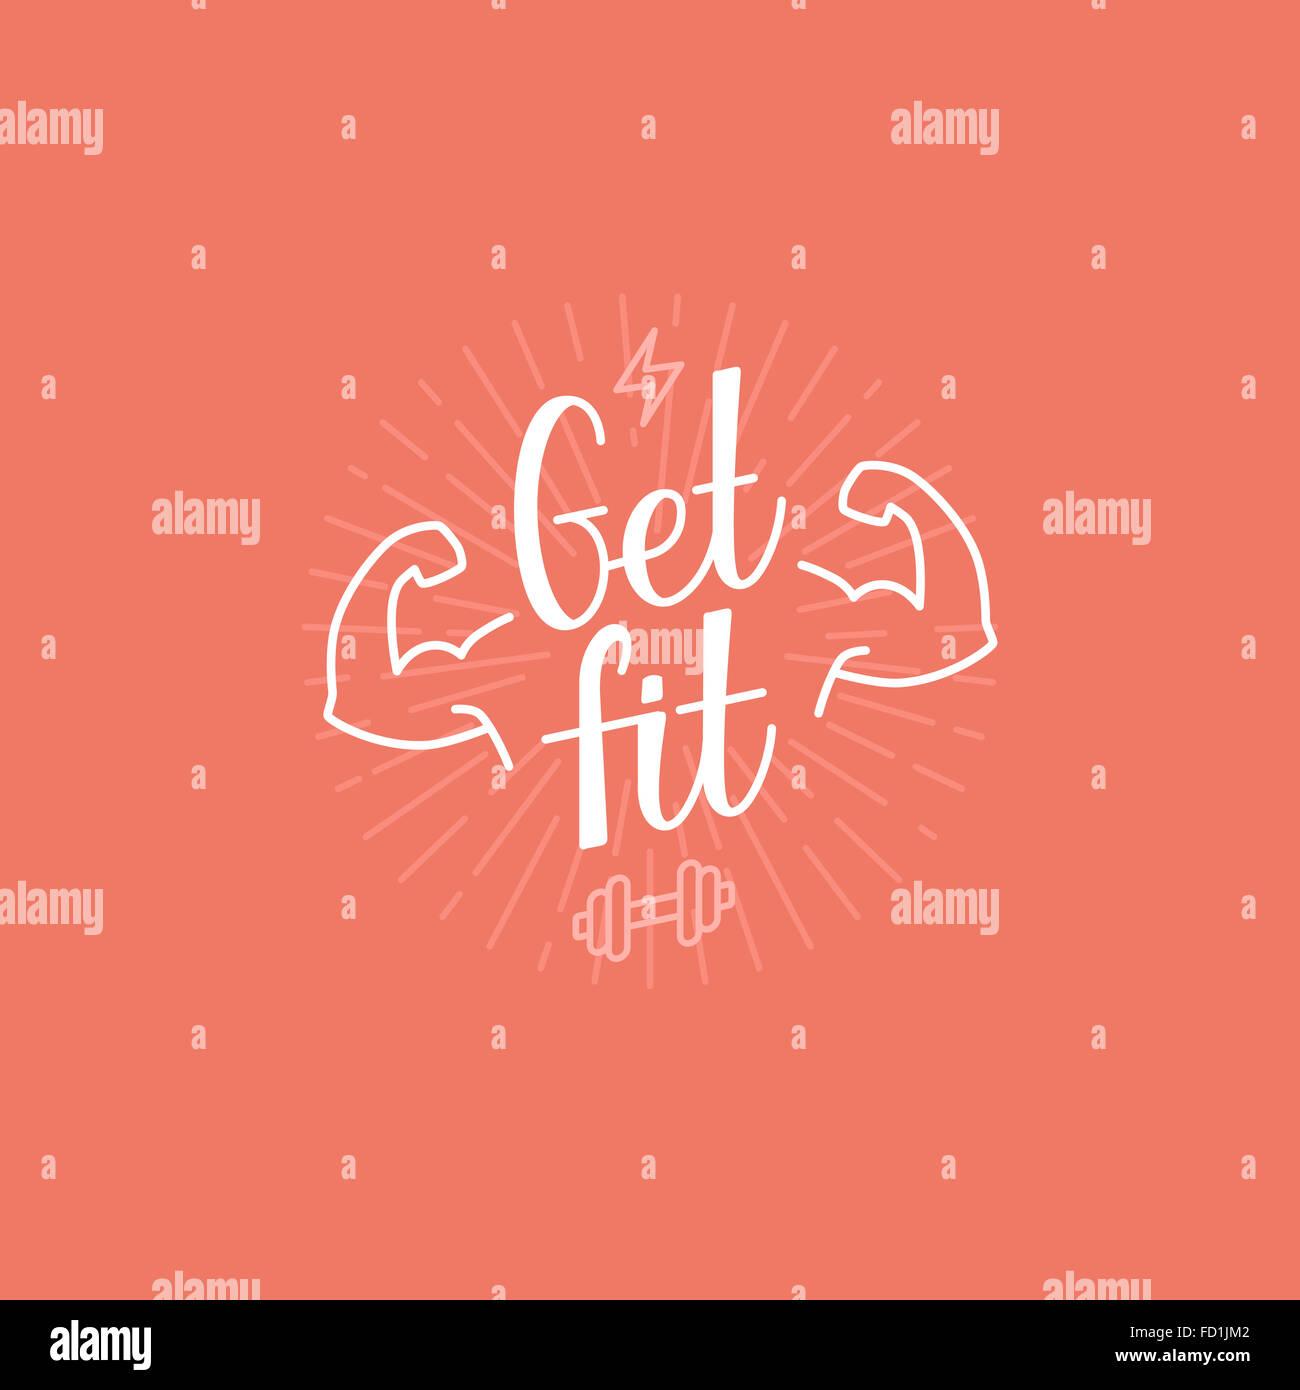 Sport motivational banner - get fit lettering - fitness poster concept - Stock Image